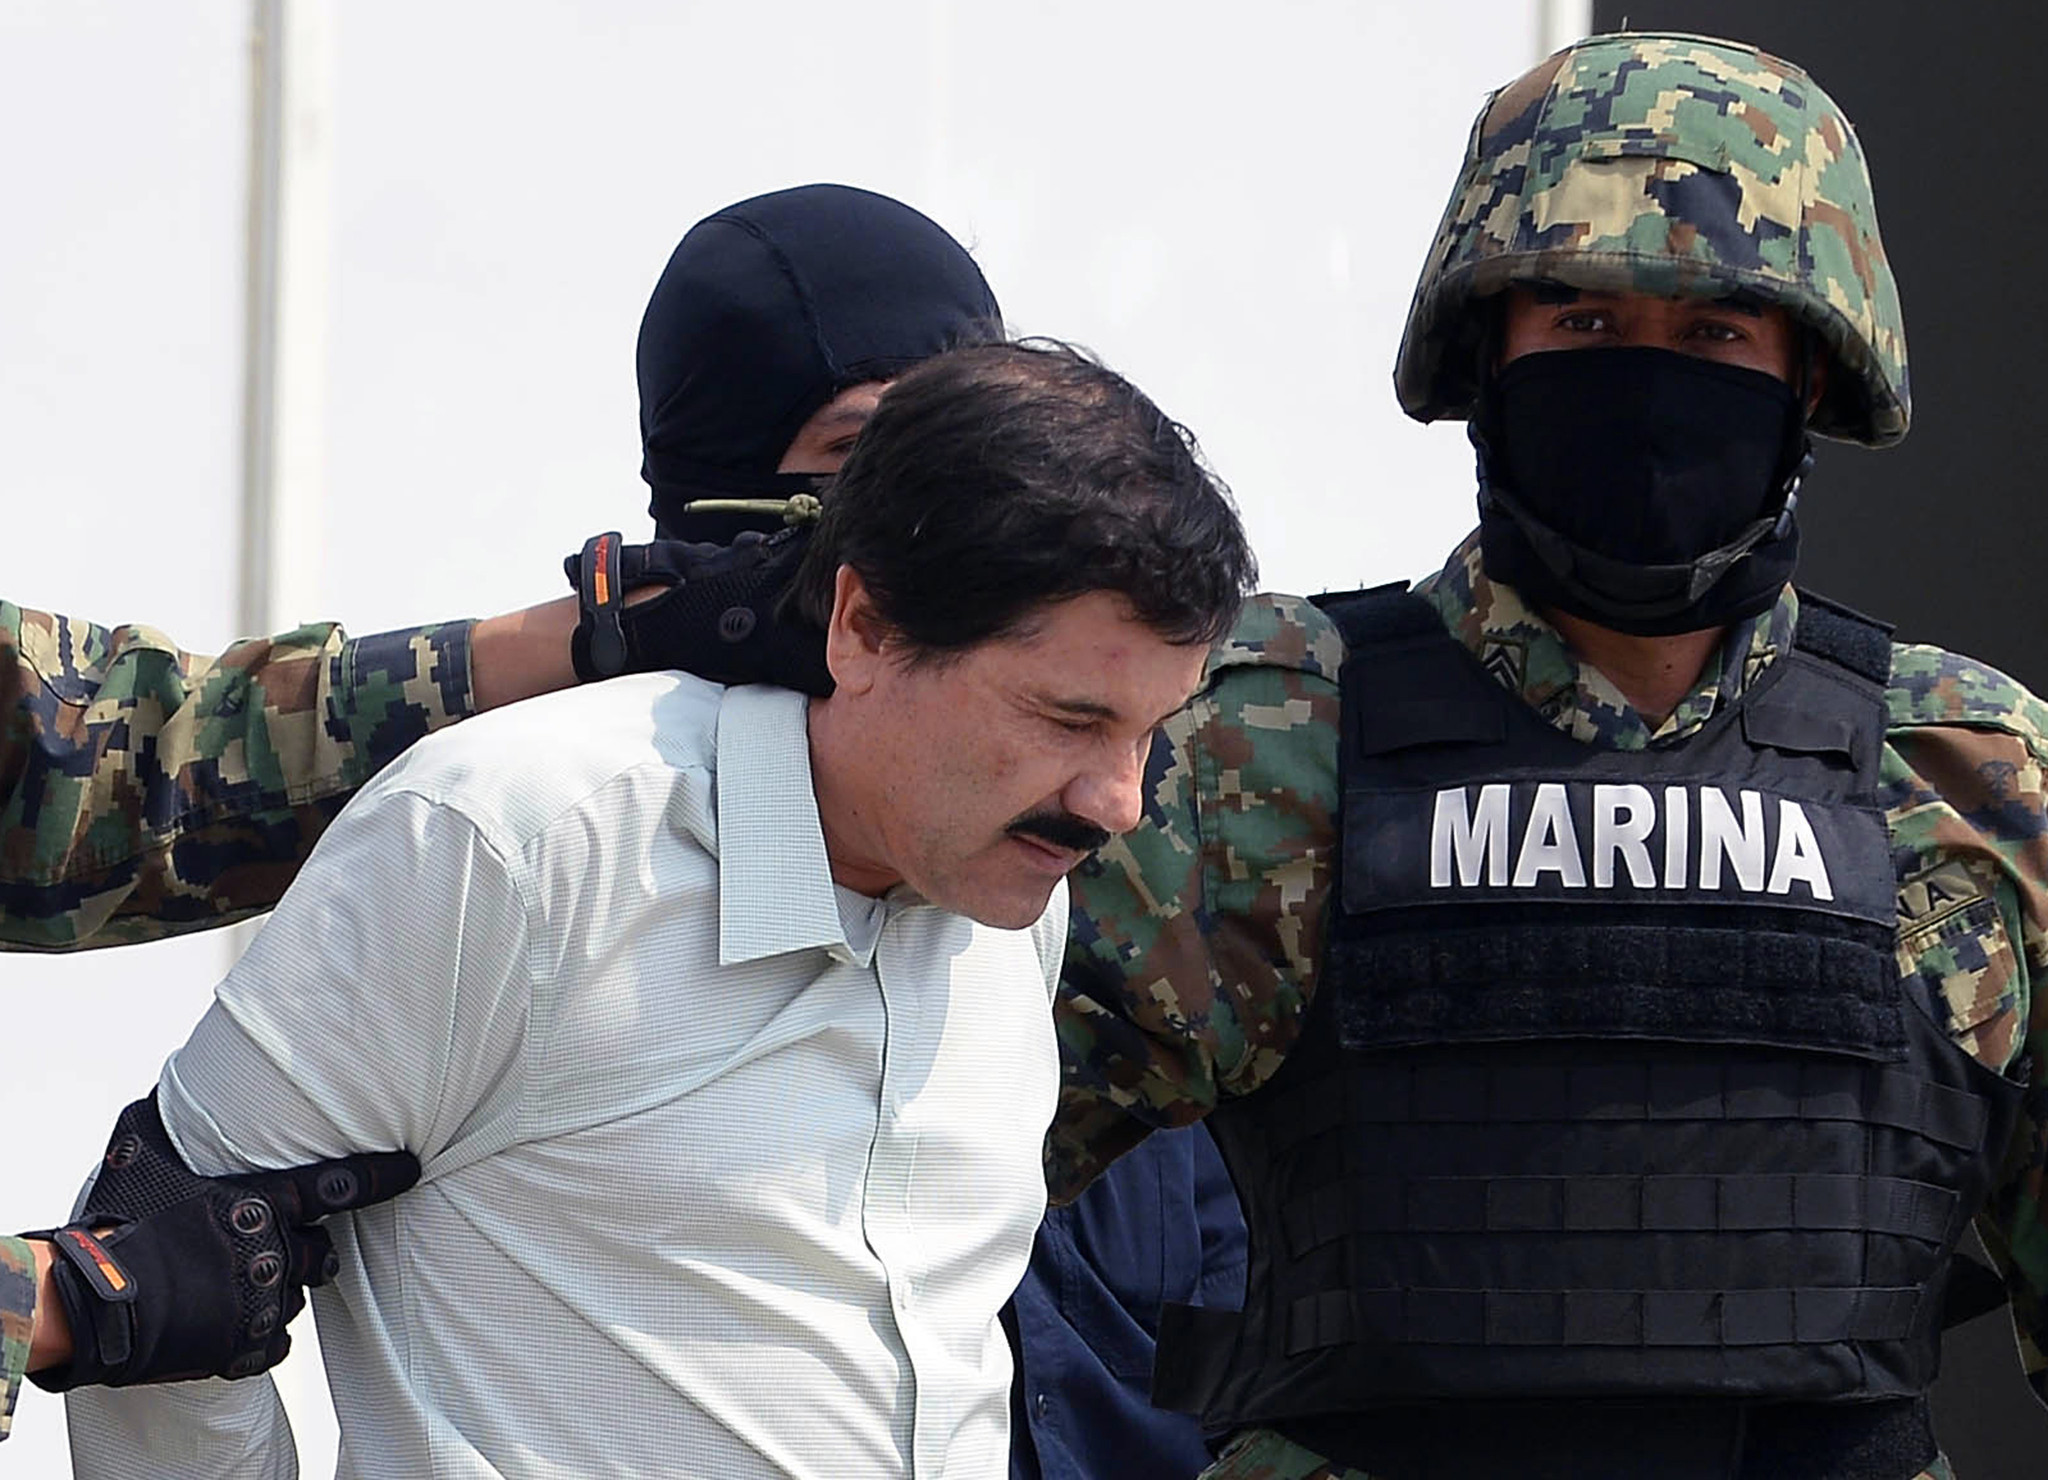 Alleged lieutenant of drug kingpin 'El Chapo' seeks minimum 10-year term